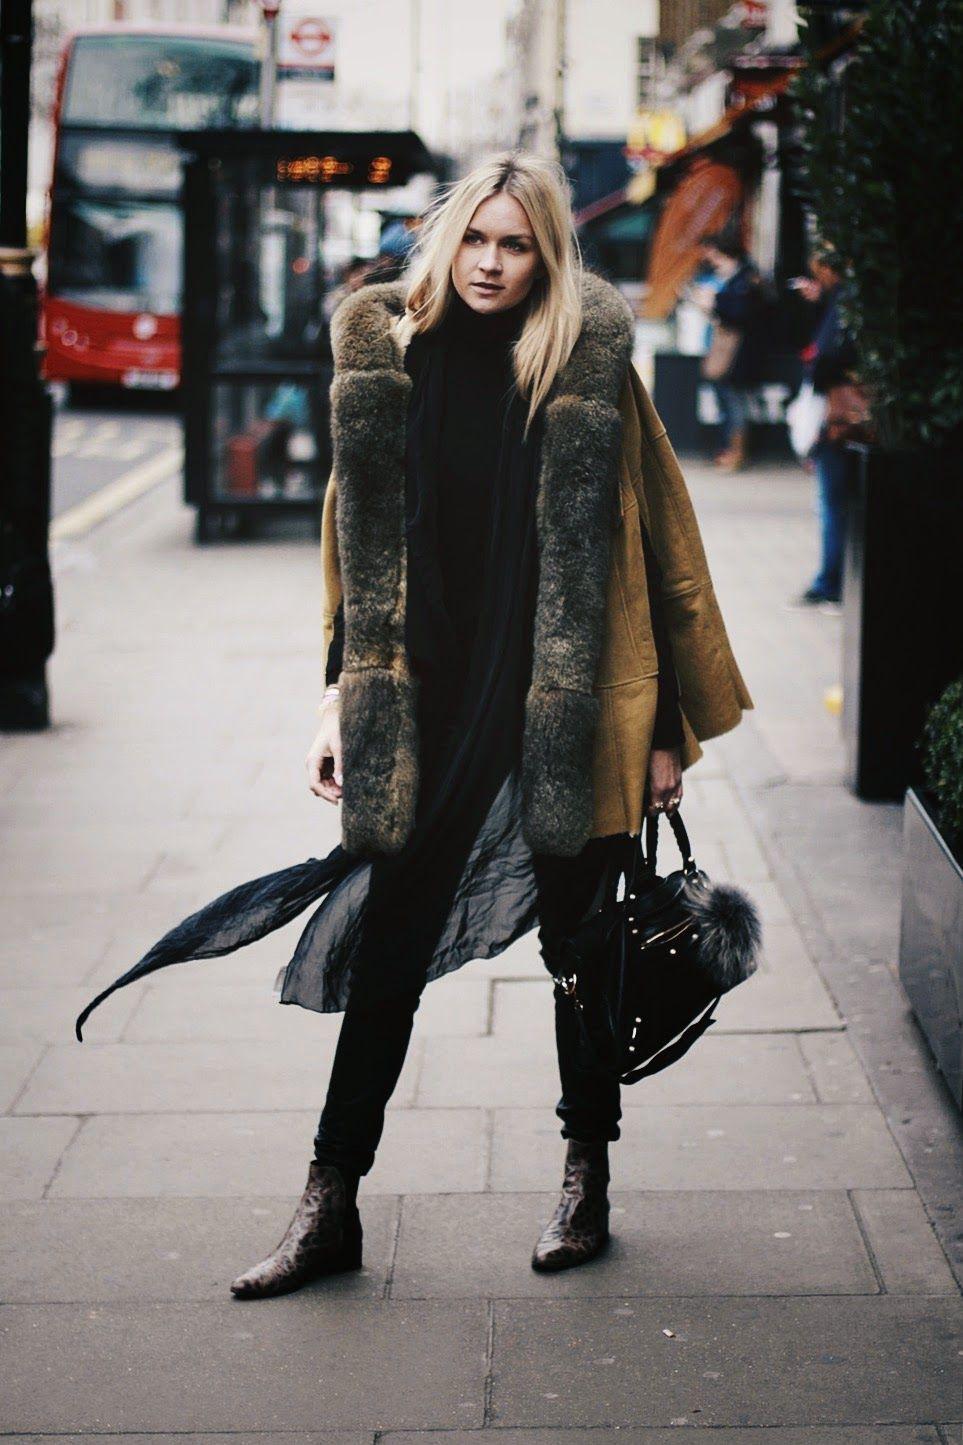 Classy outfit boho streetstyle winter, winter clothing, street fashion, flight jacket, boho chic